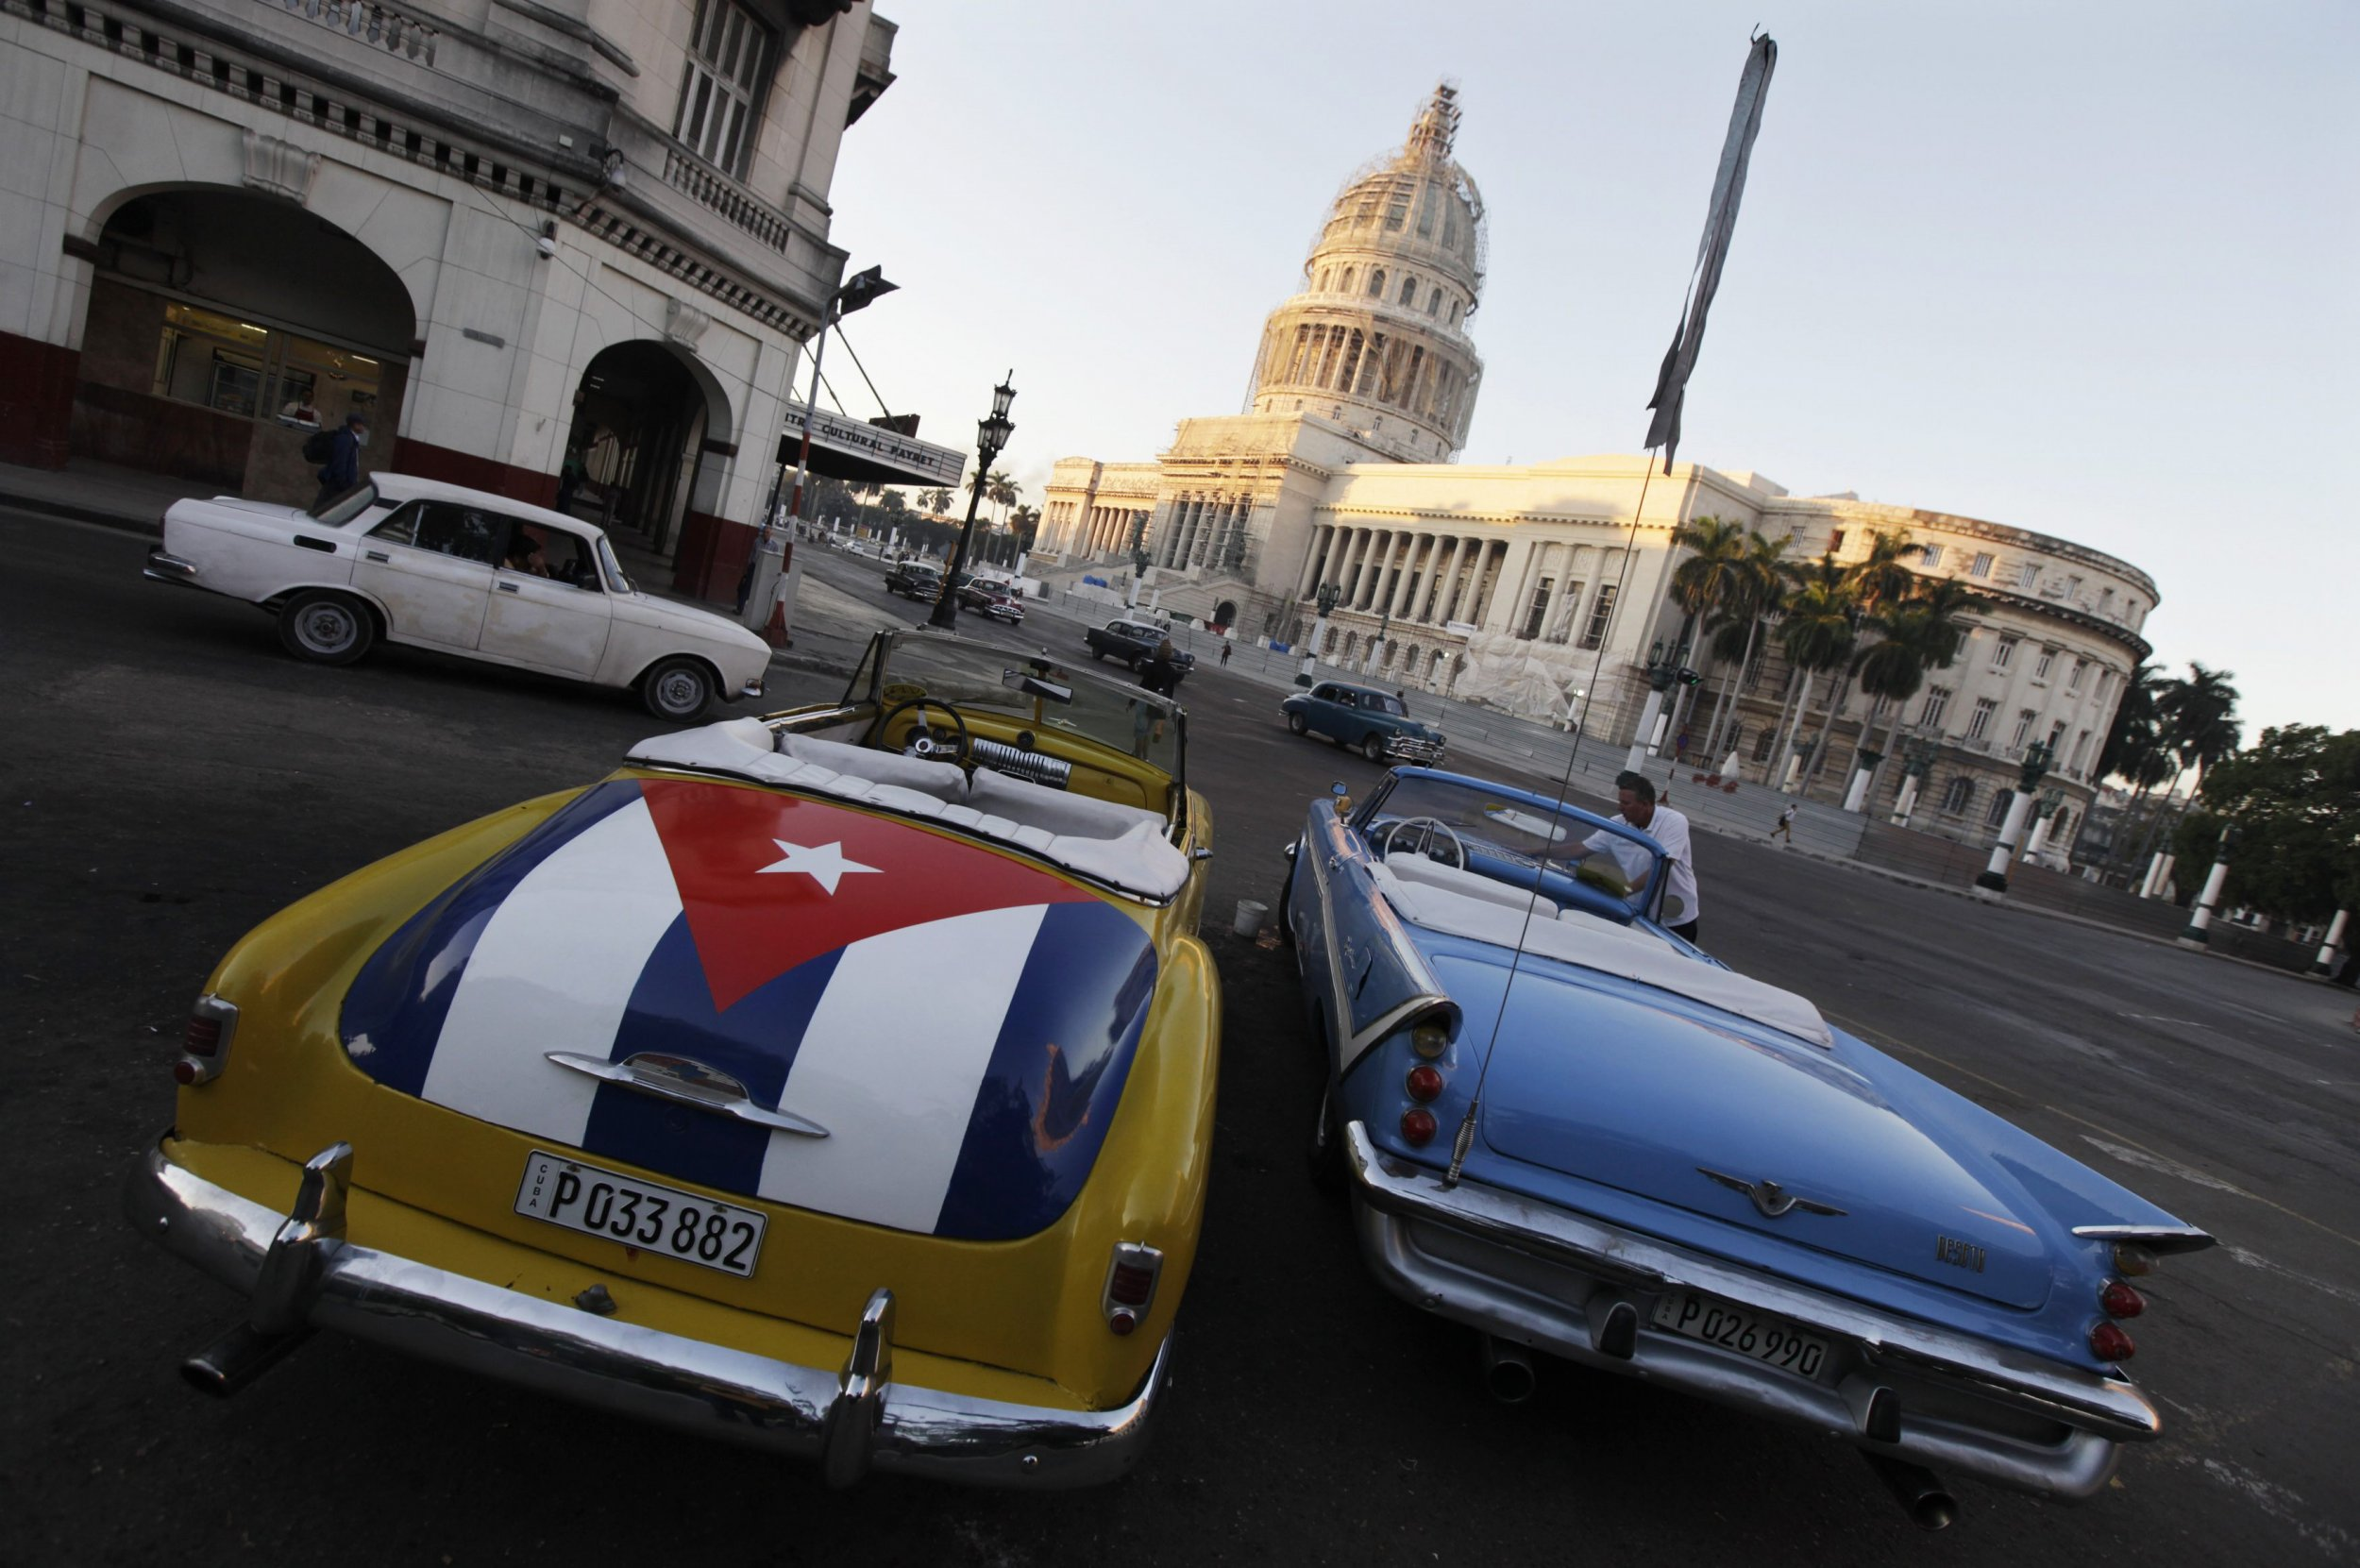 2014-12-18T145755Z_736260386_GM1EACI1RO301_RTRMADP_3_CUBA-USA